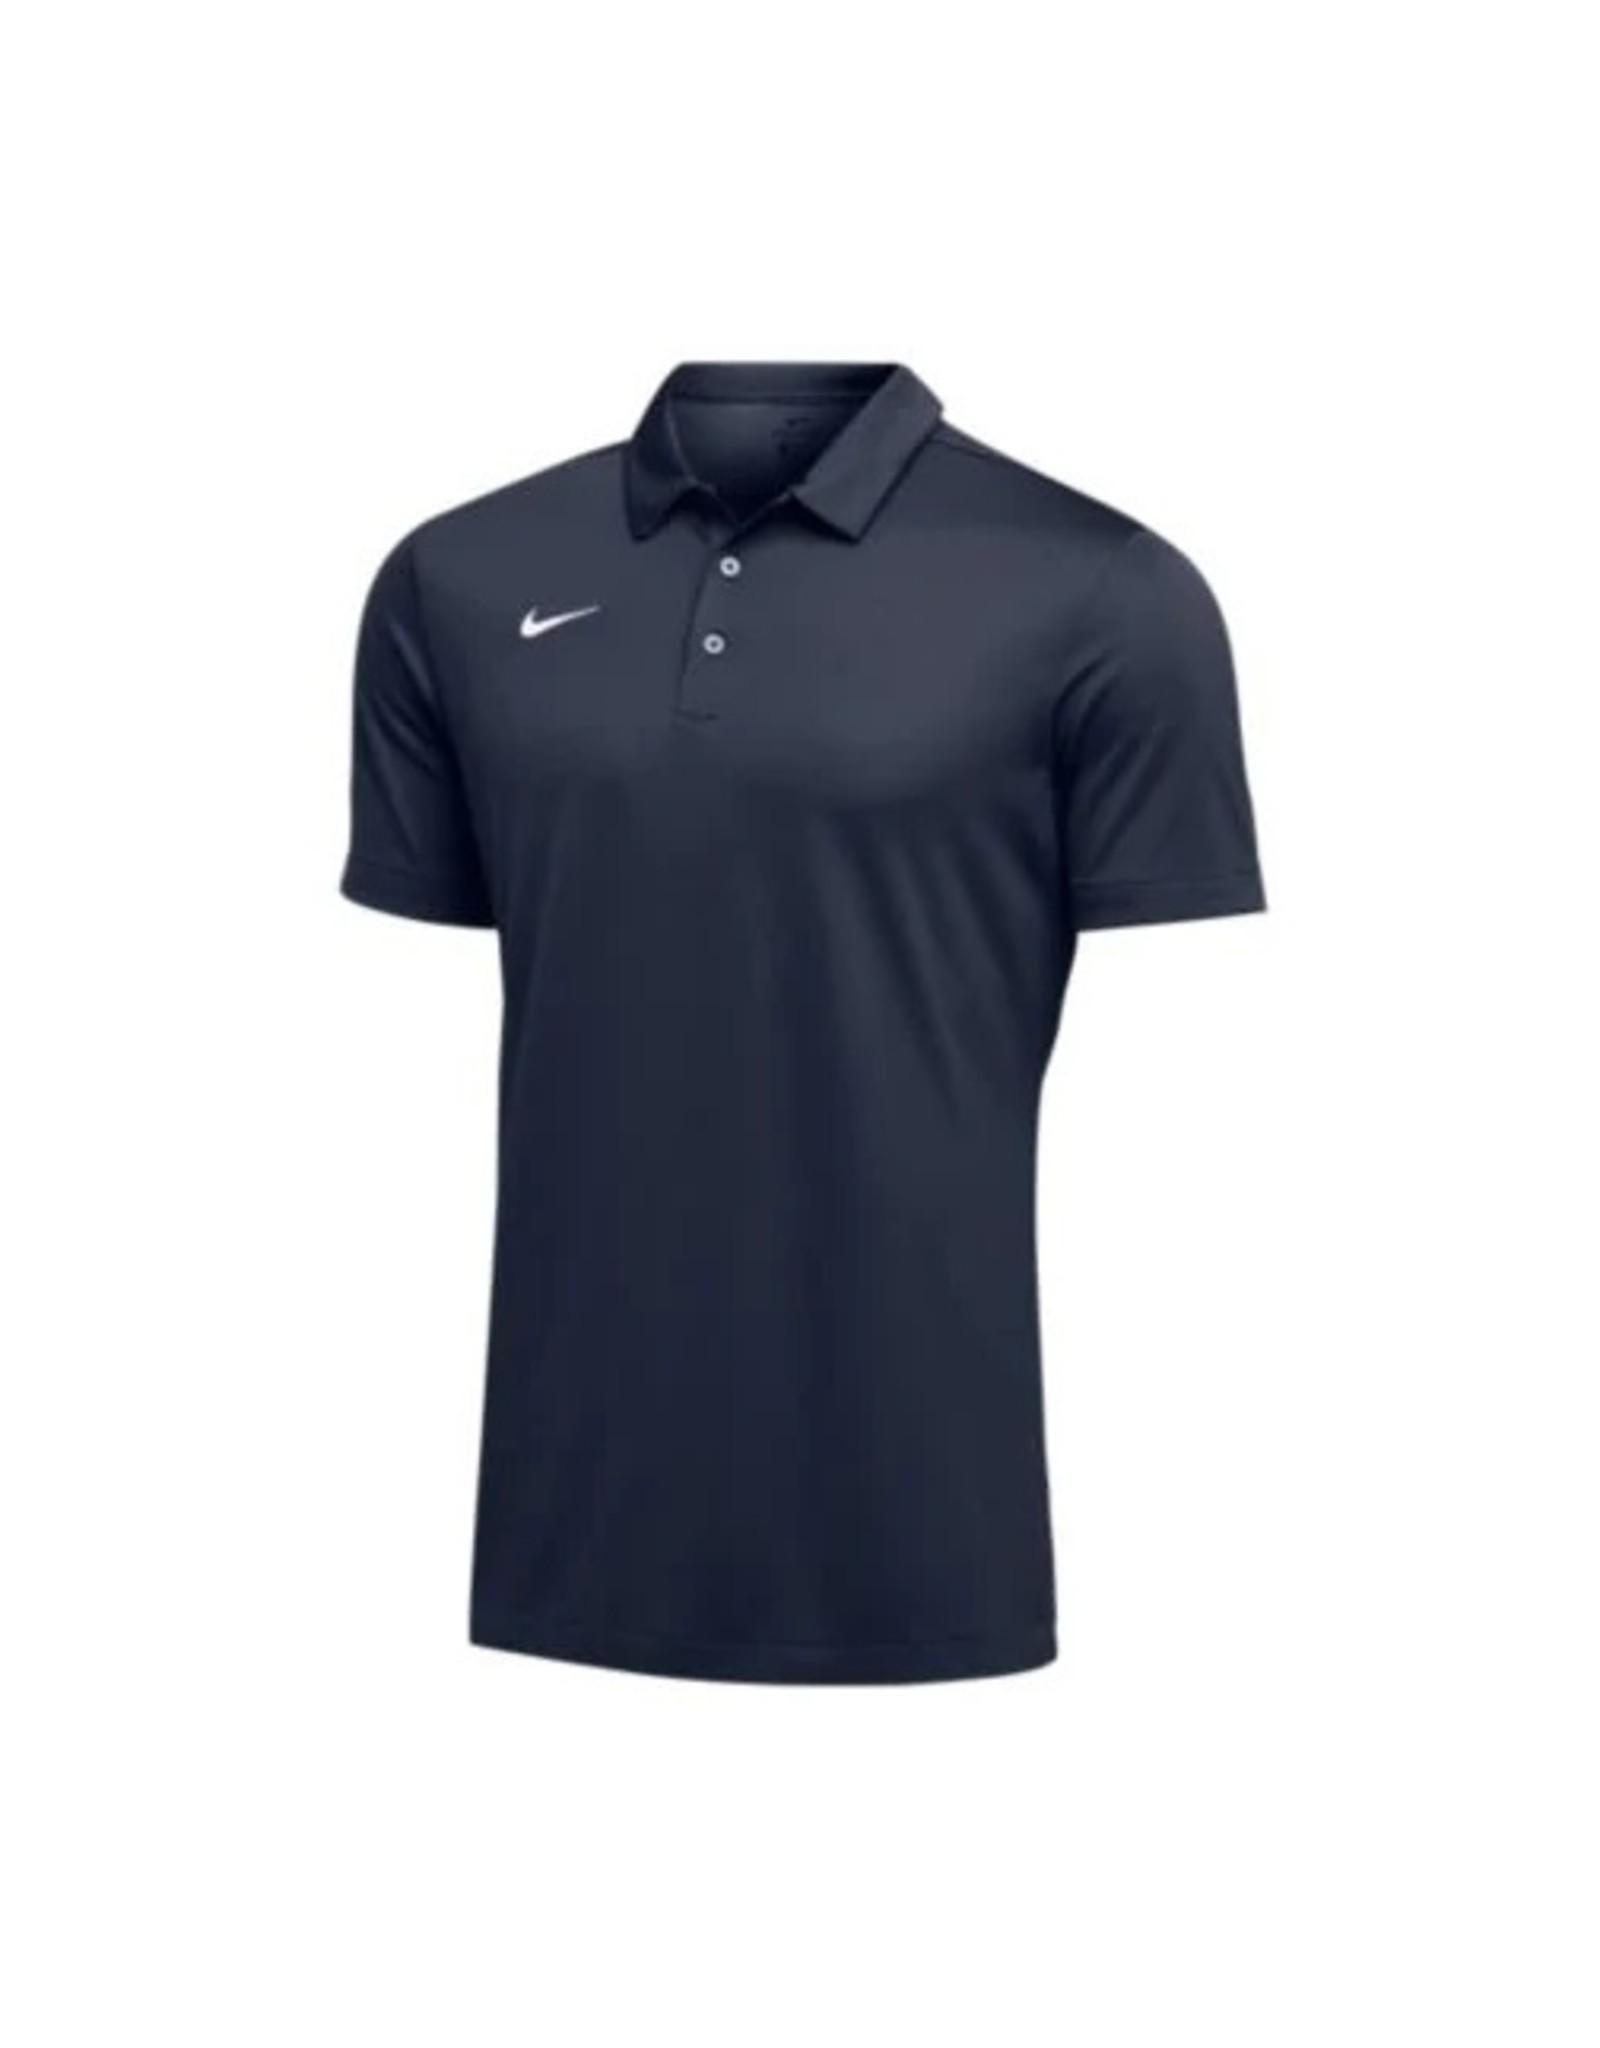 NON-UNIFORM Nike Lacrosse Men's Polo